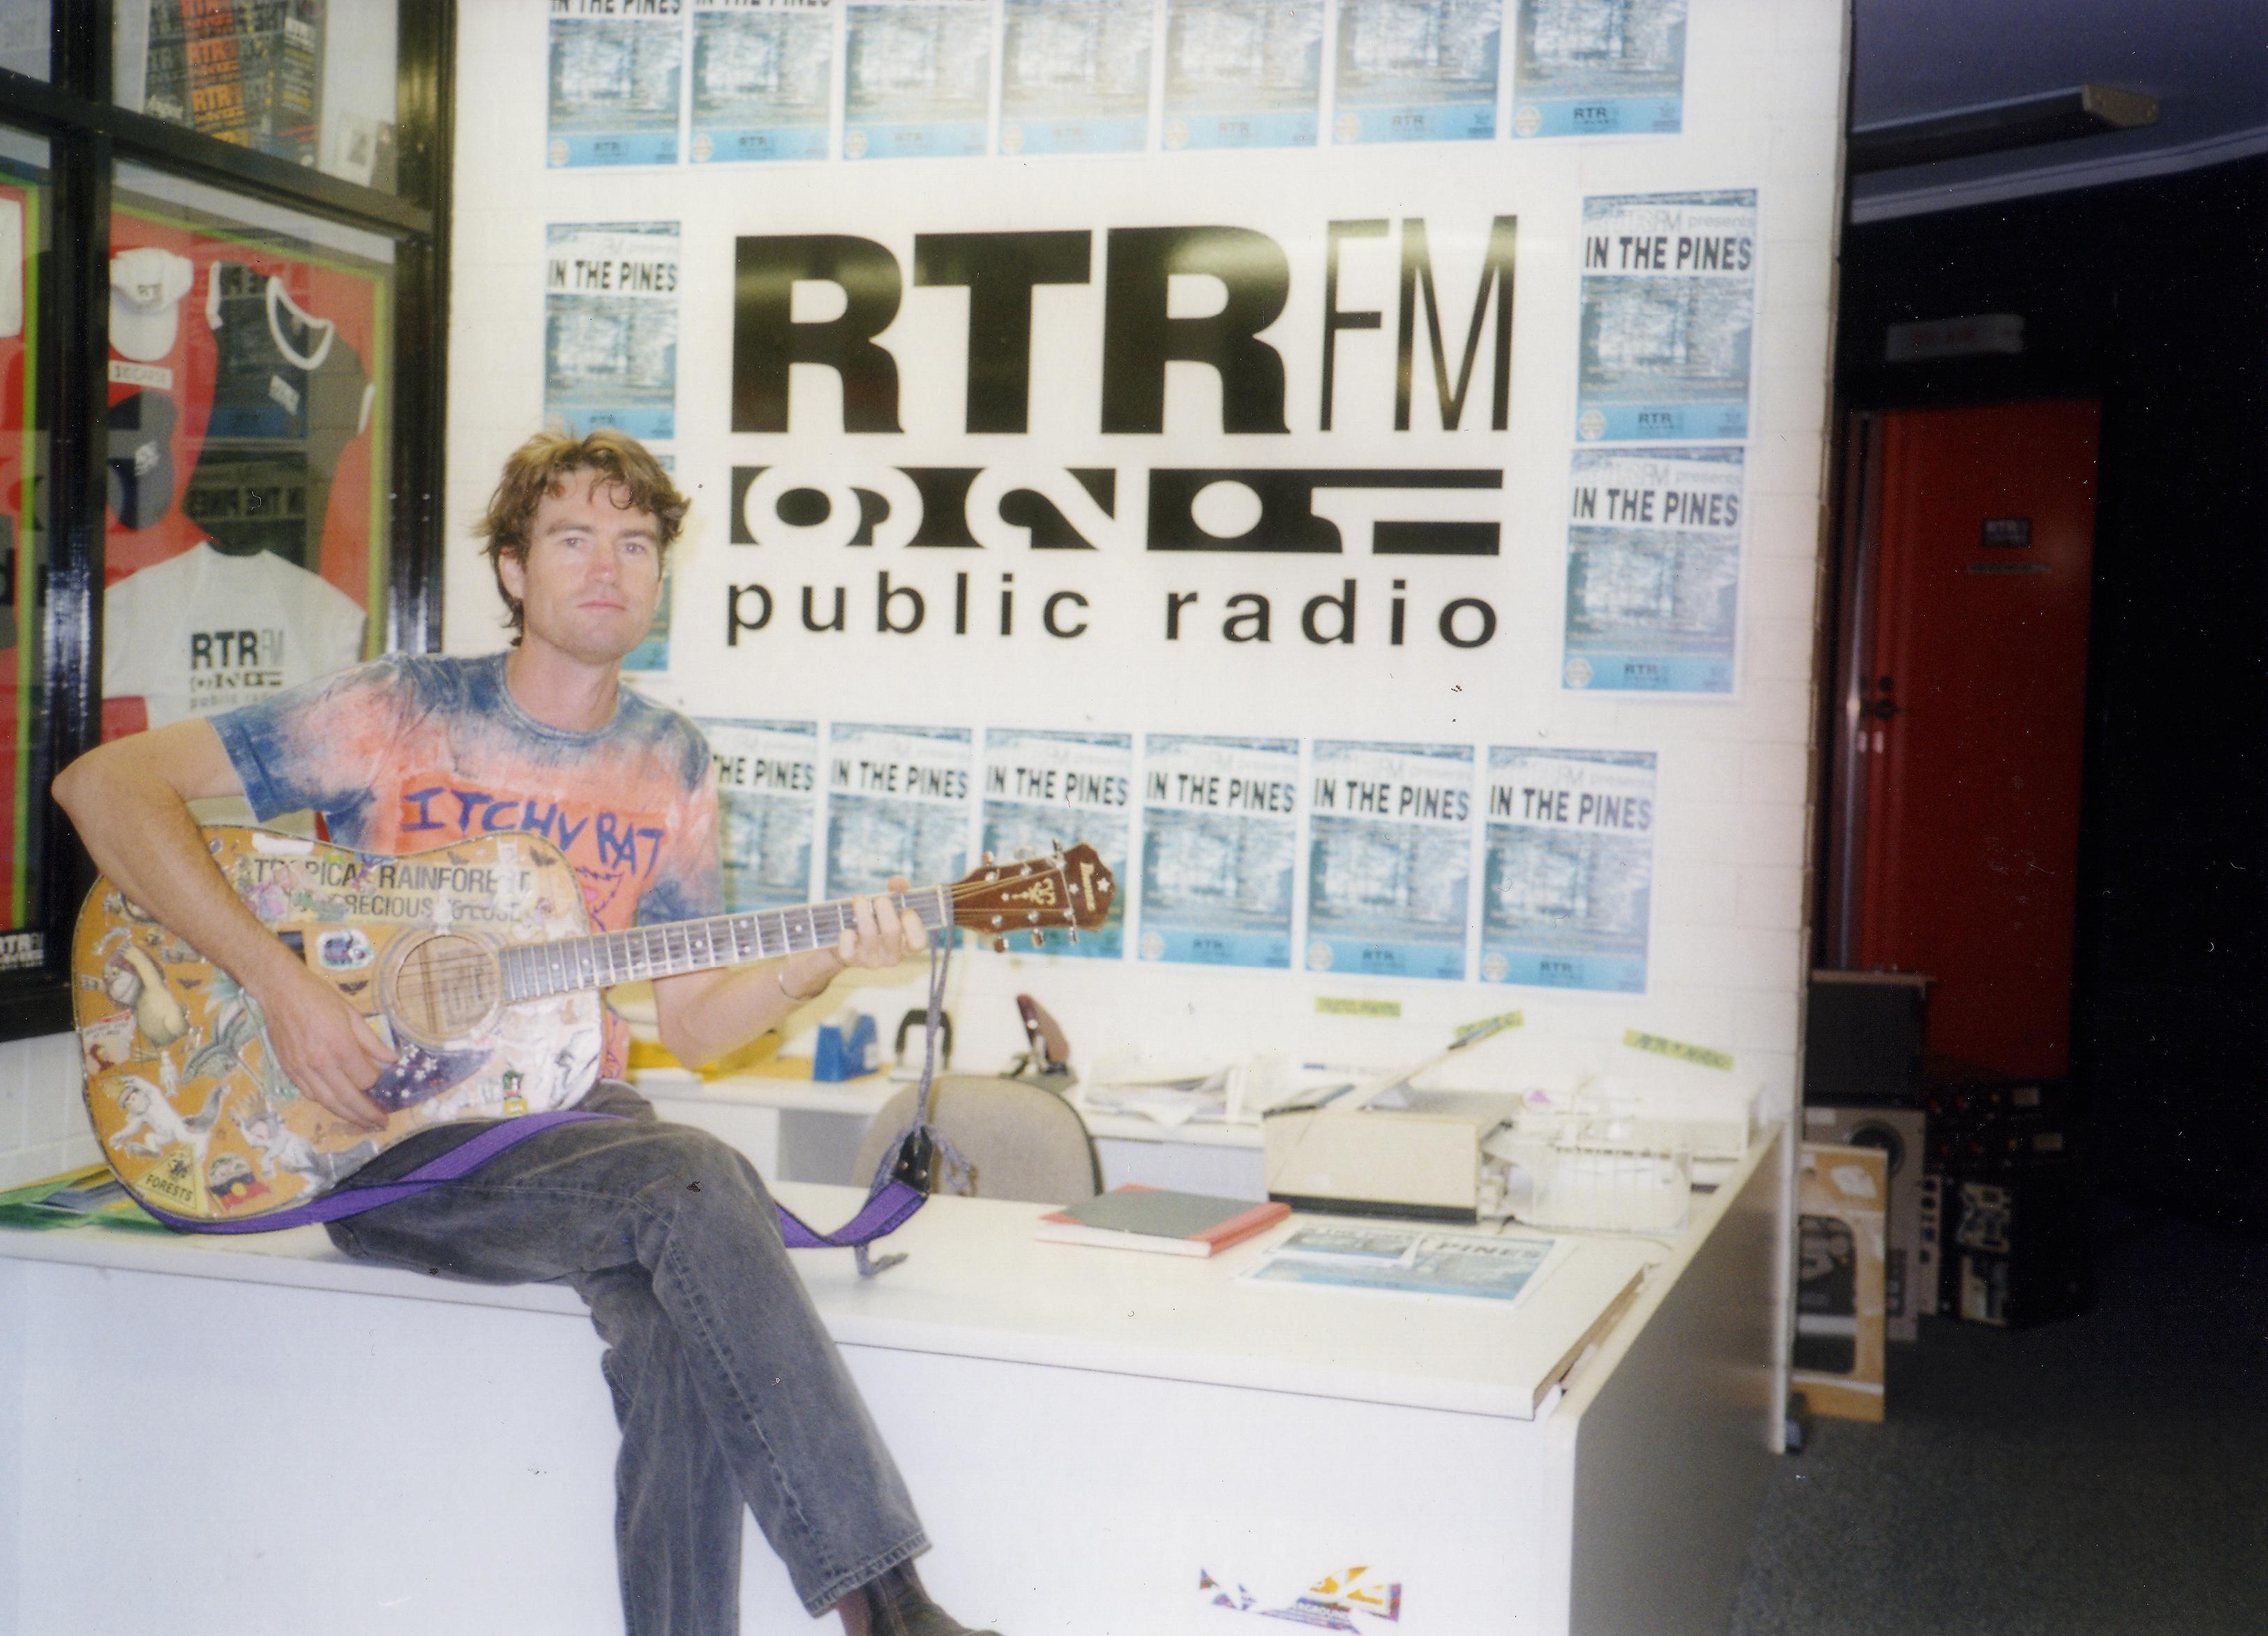 Johnnie Mac RTR FM